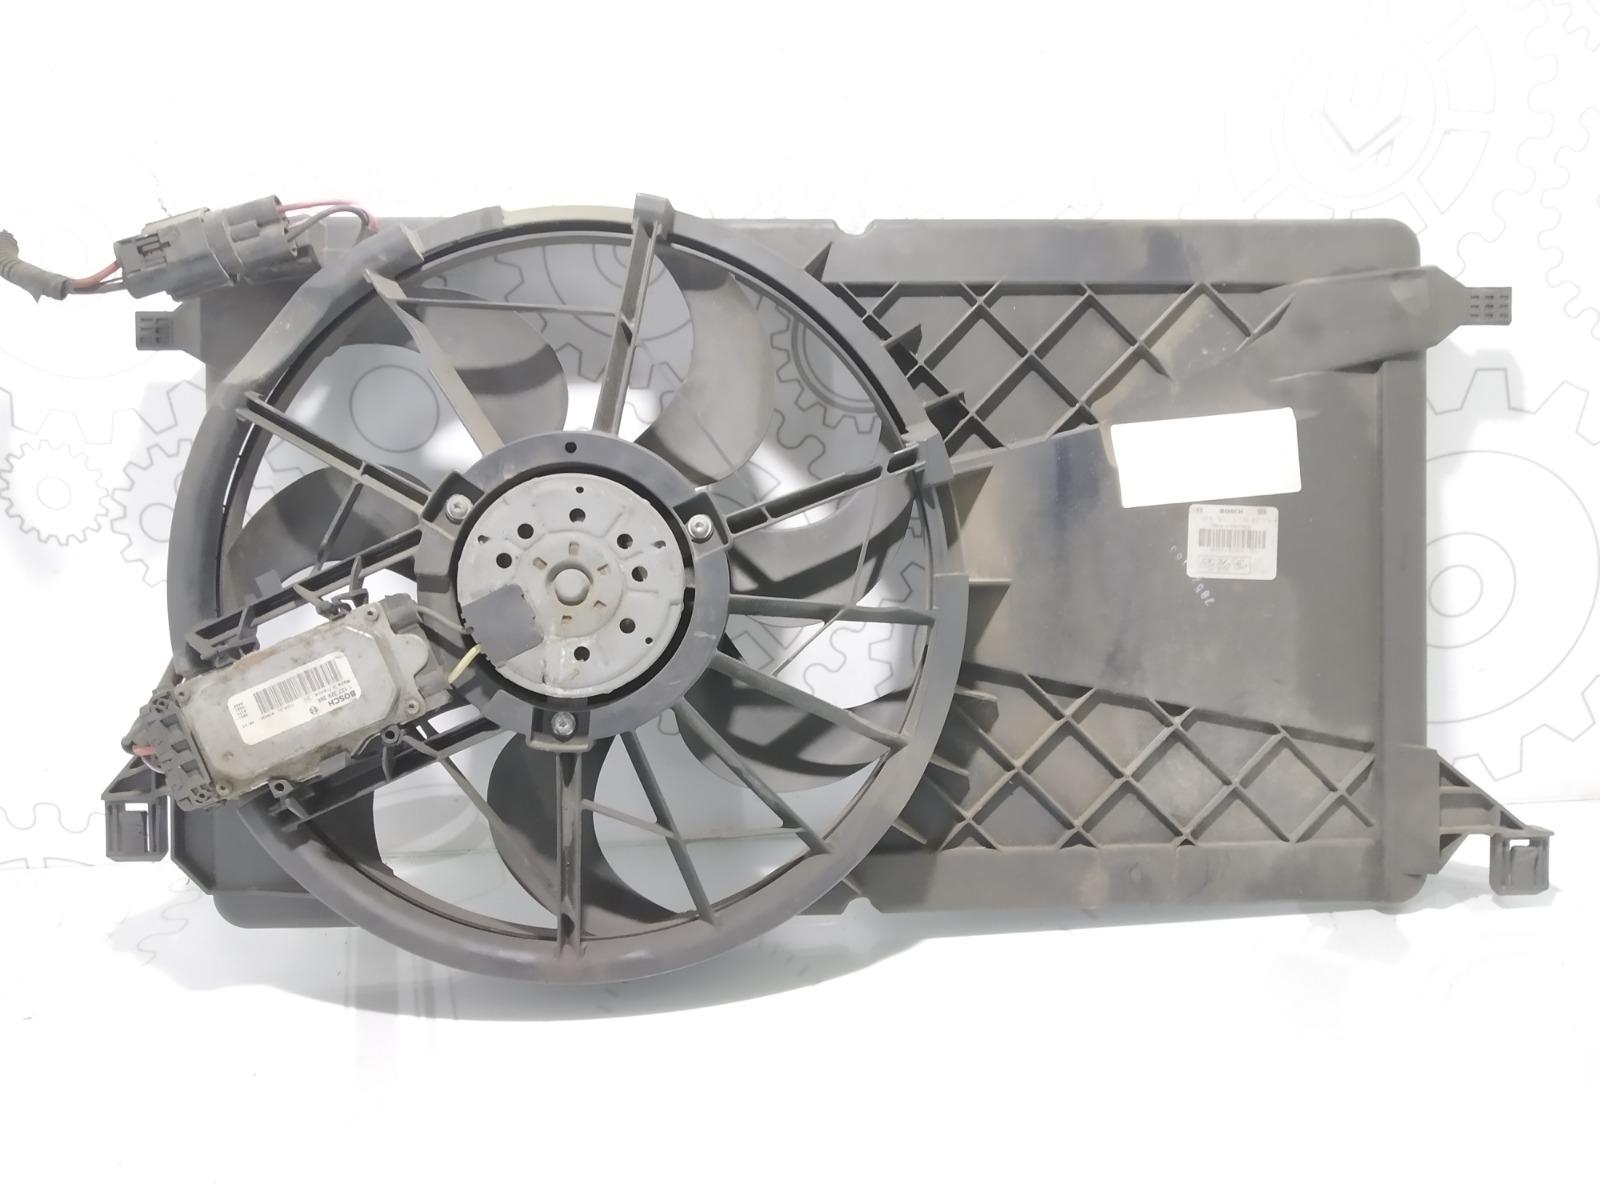 Вентилятор радиатора Ford C-Max 1.8 I 2007 (б/у)